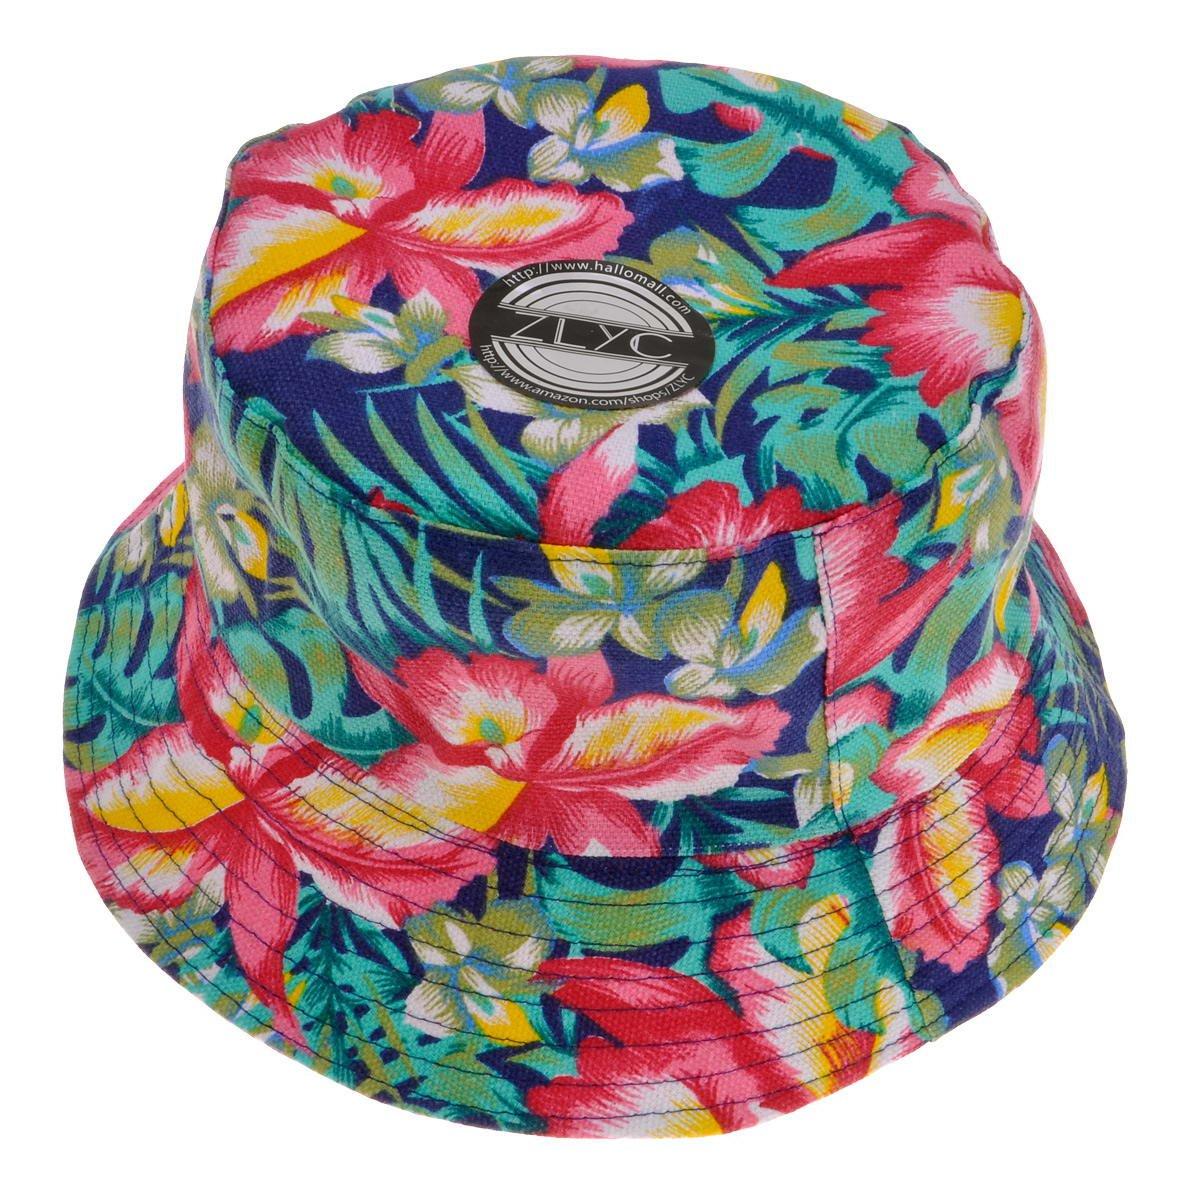 ZLYC Women Funky Floral Plant Rainforest Print Canvas Bucket Hat Fishmen Cap, Red ZYJ-MZ-092-RD_CA